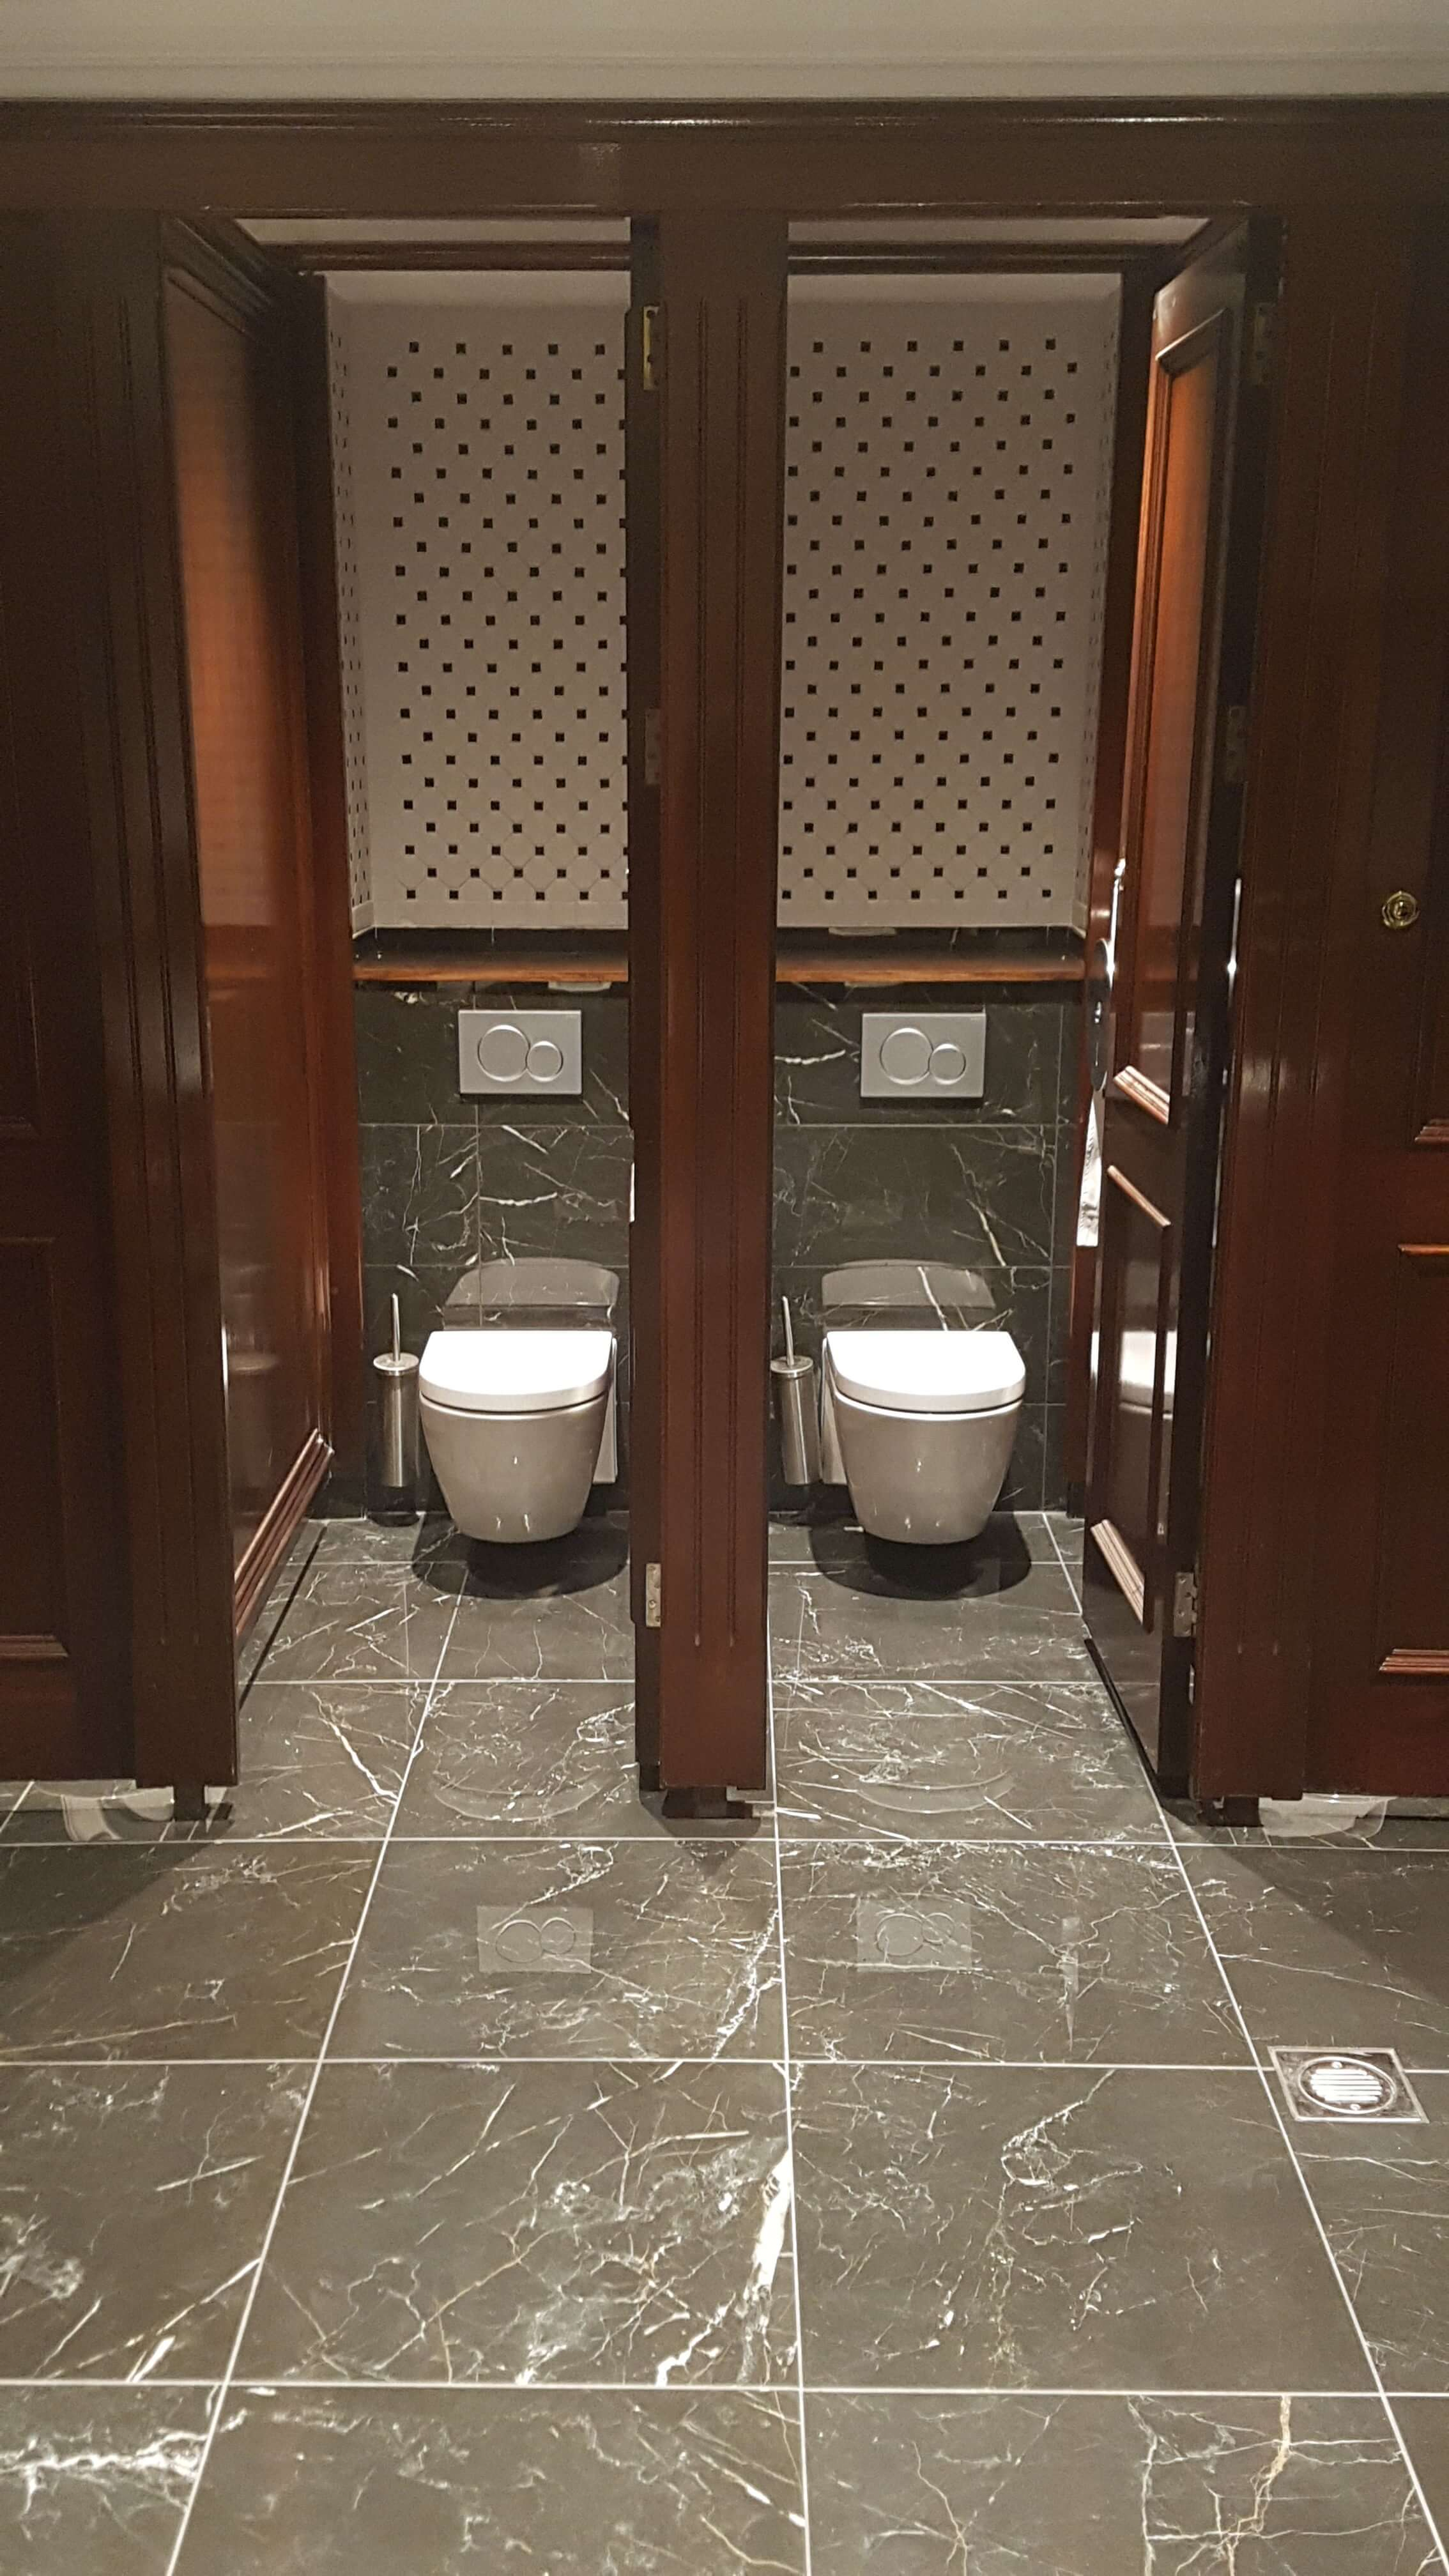 The Davenport Hotel Toilets